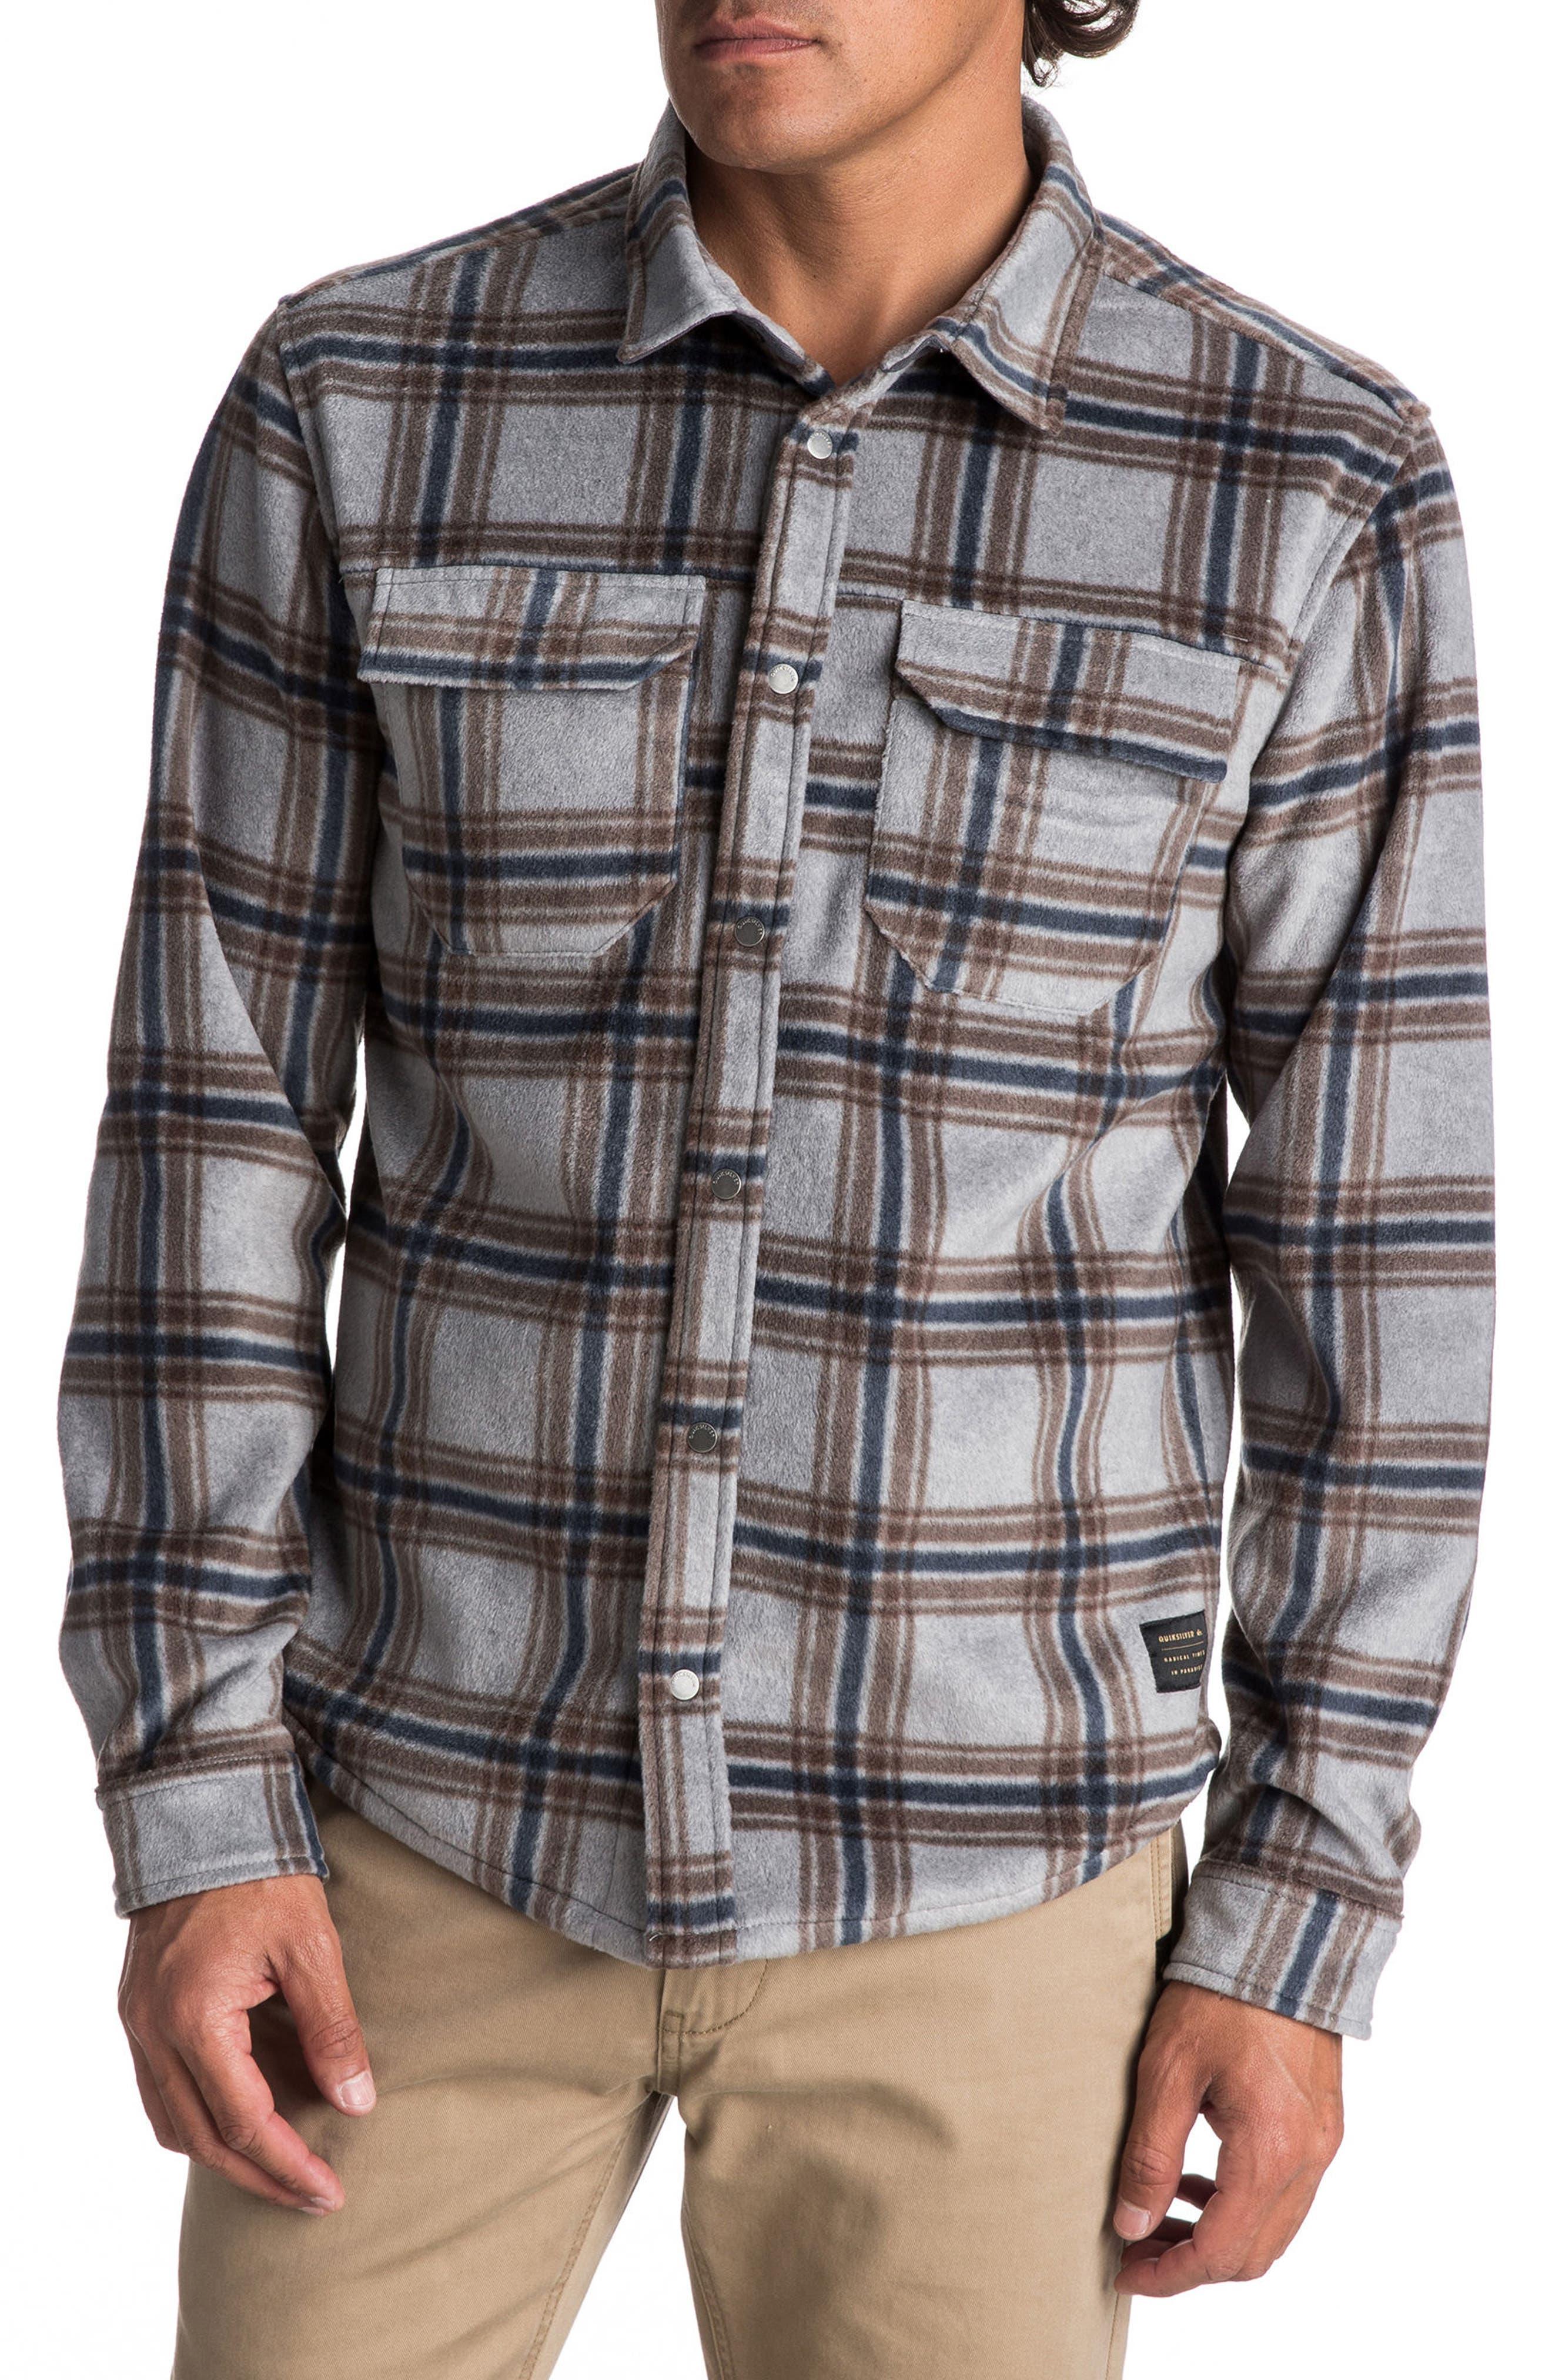 Surf Day Polar Fleece Shirt,                             Main thumbnail 1, color,                             020